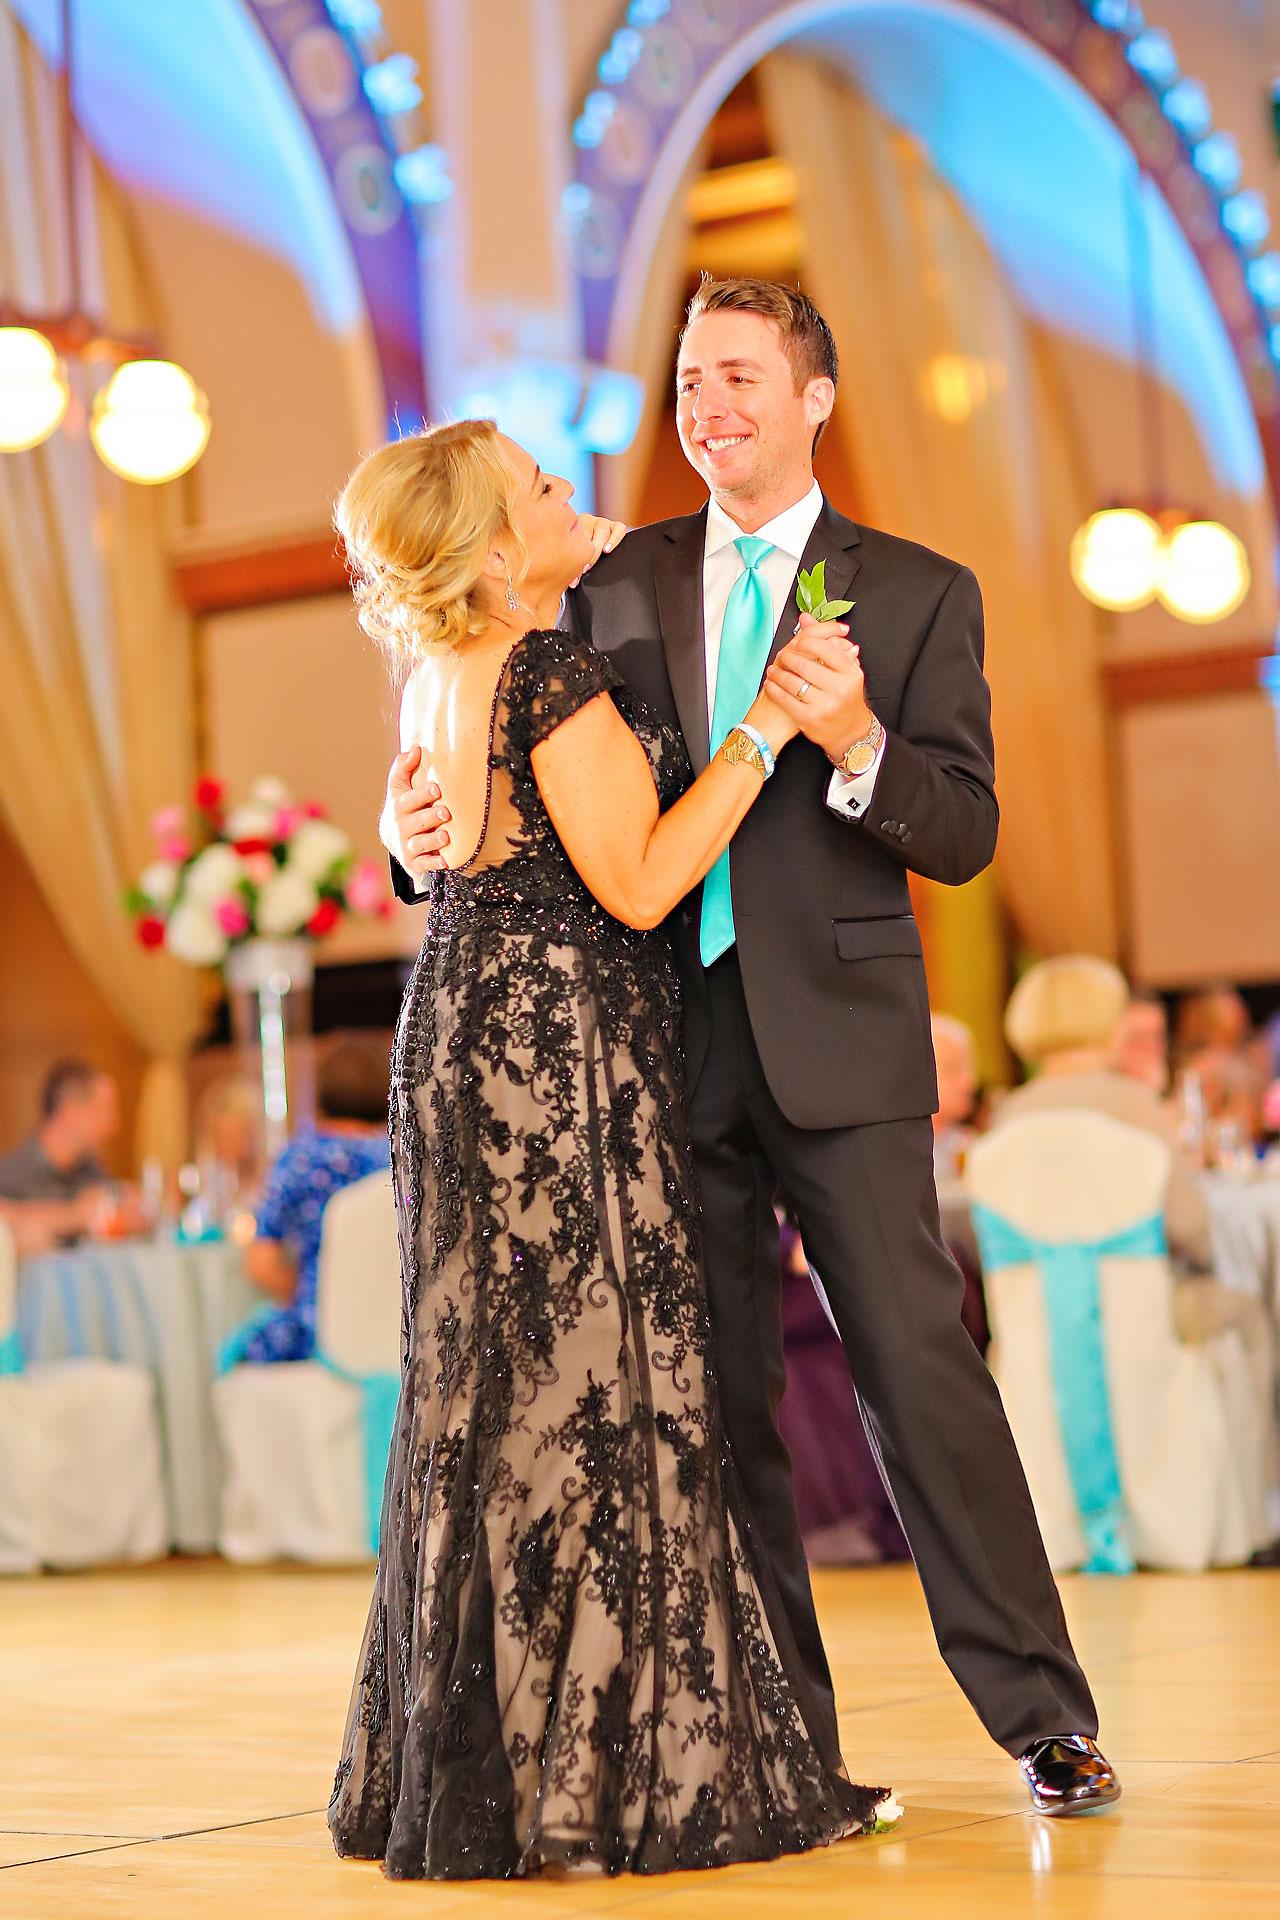 Rachel Brandon Scottish Rite Crowne Plaza Wedding 260